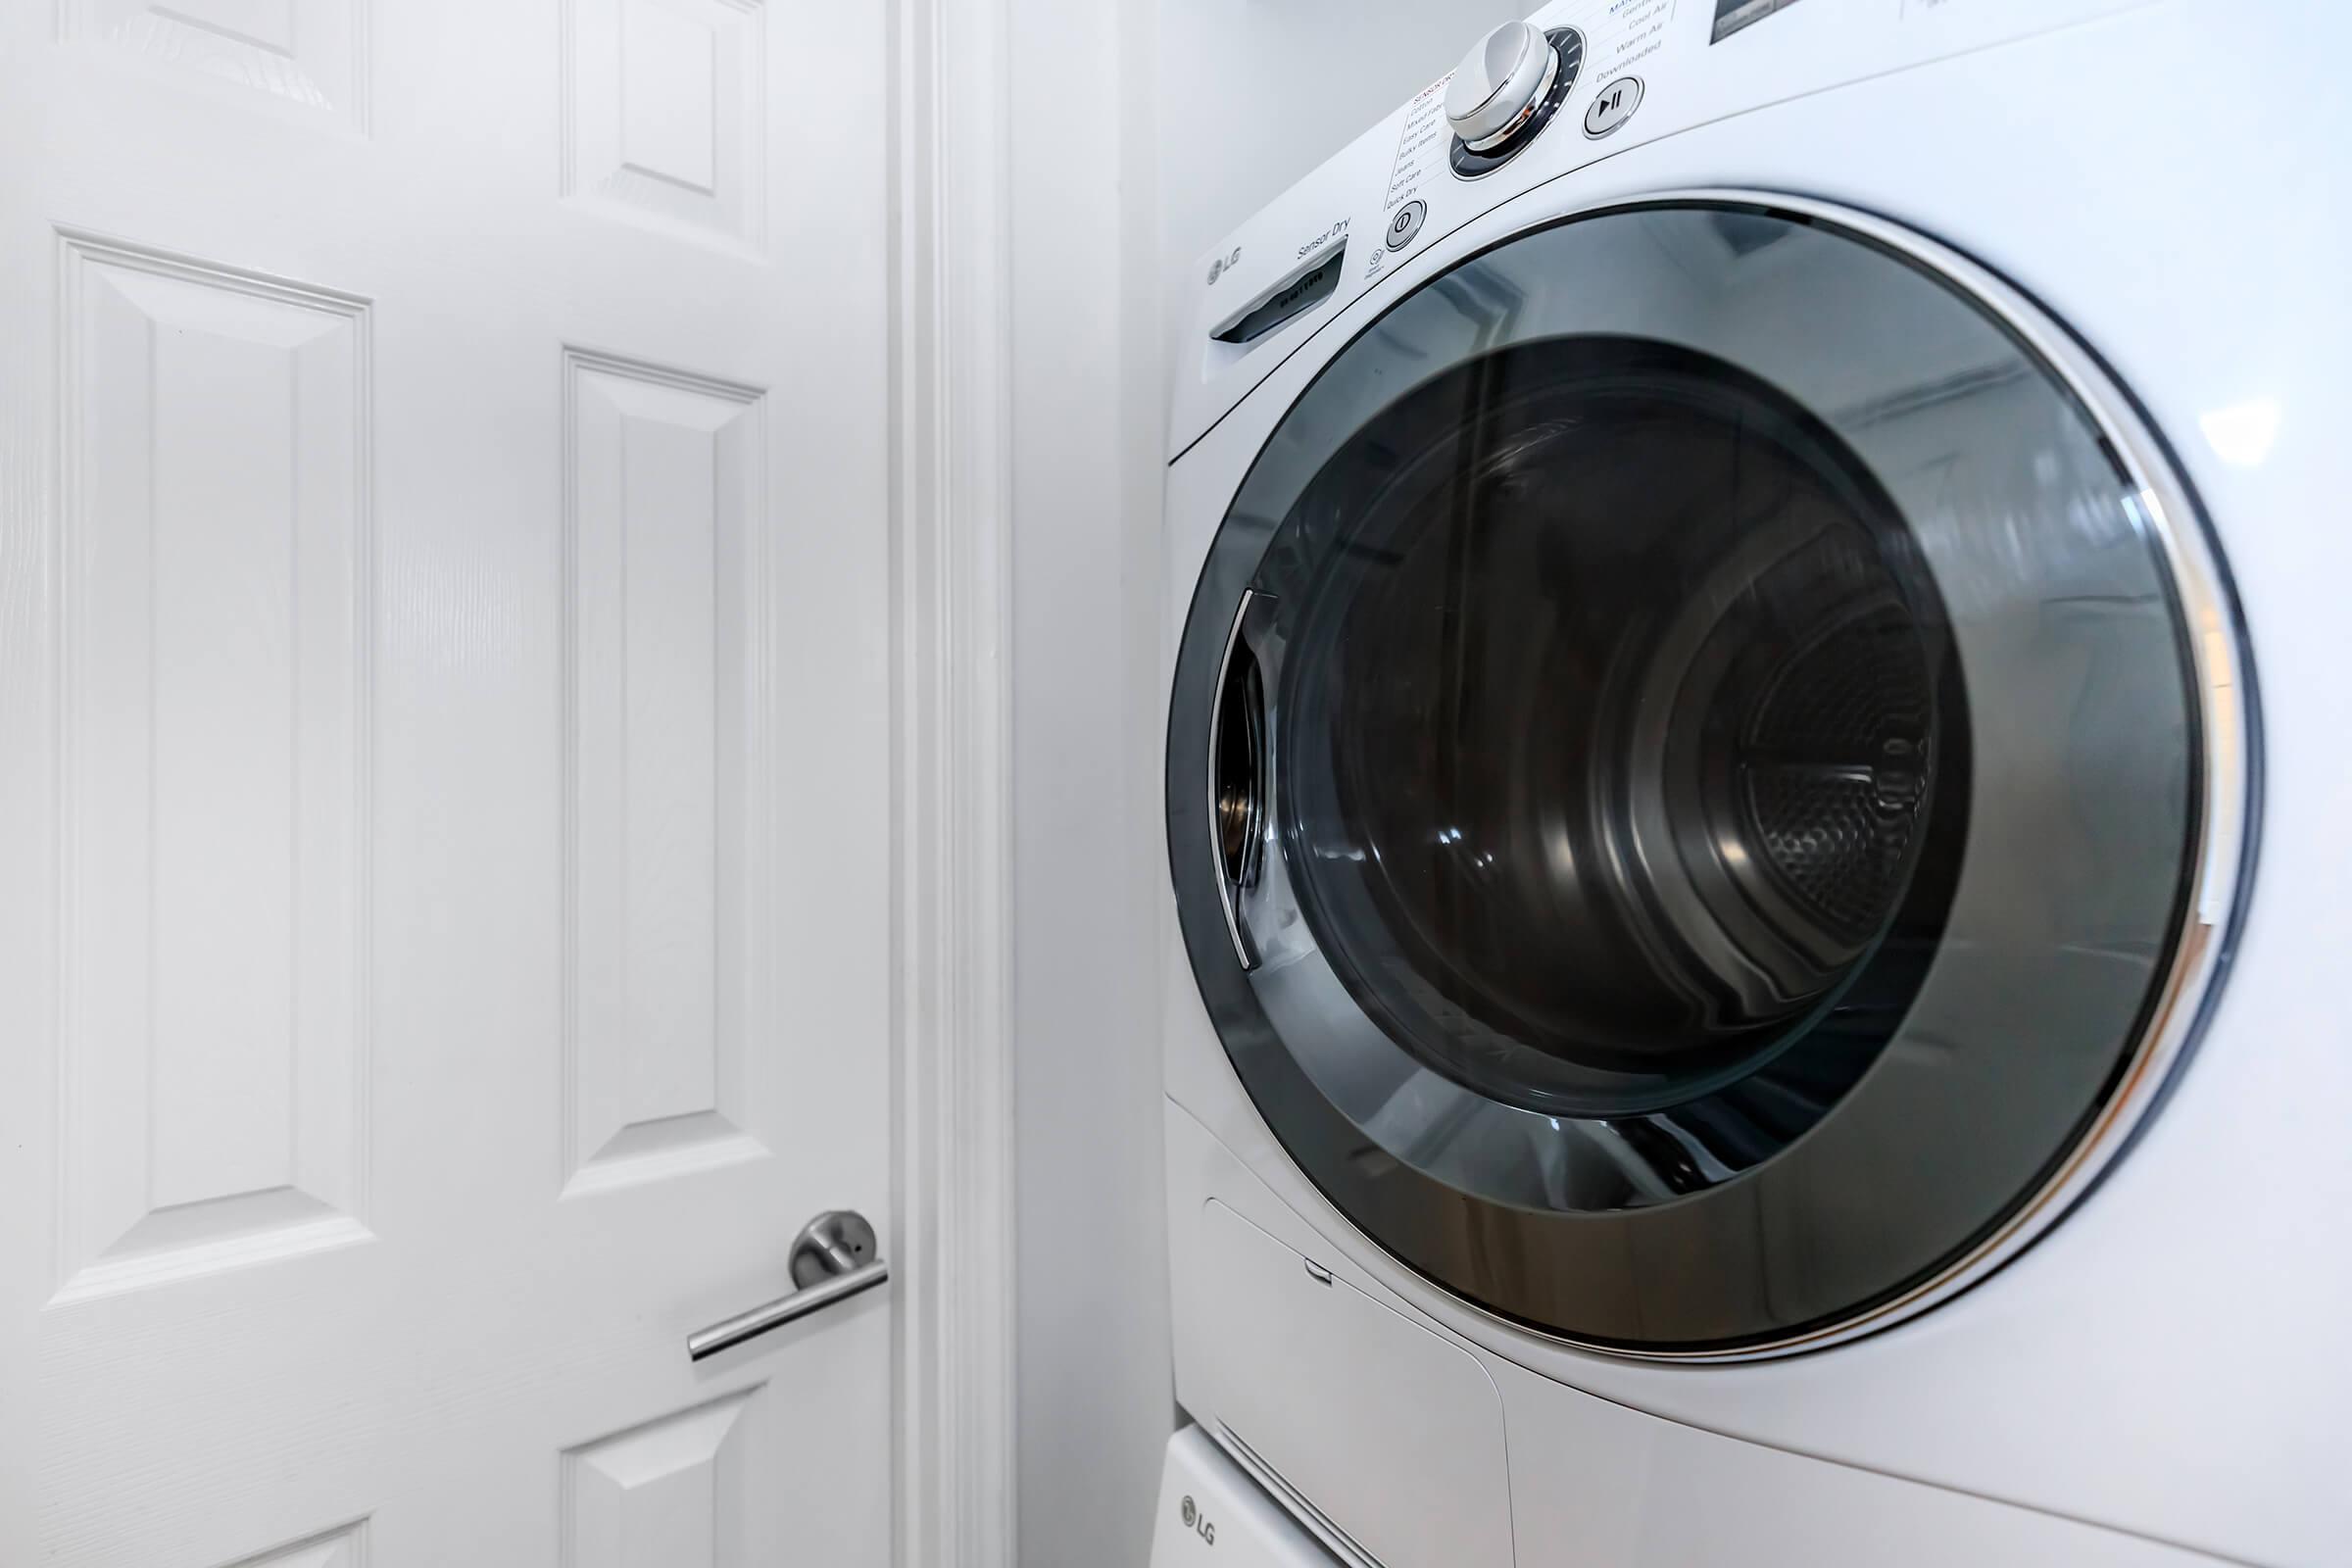 Laundry Room at Whitestoneat Landmark in Alexandria VA